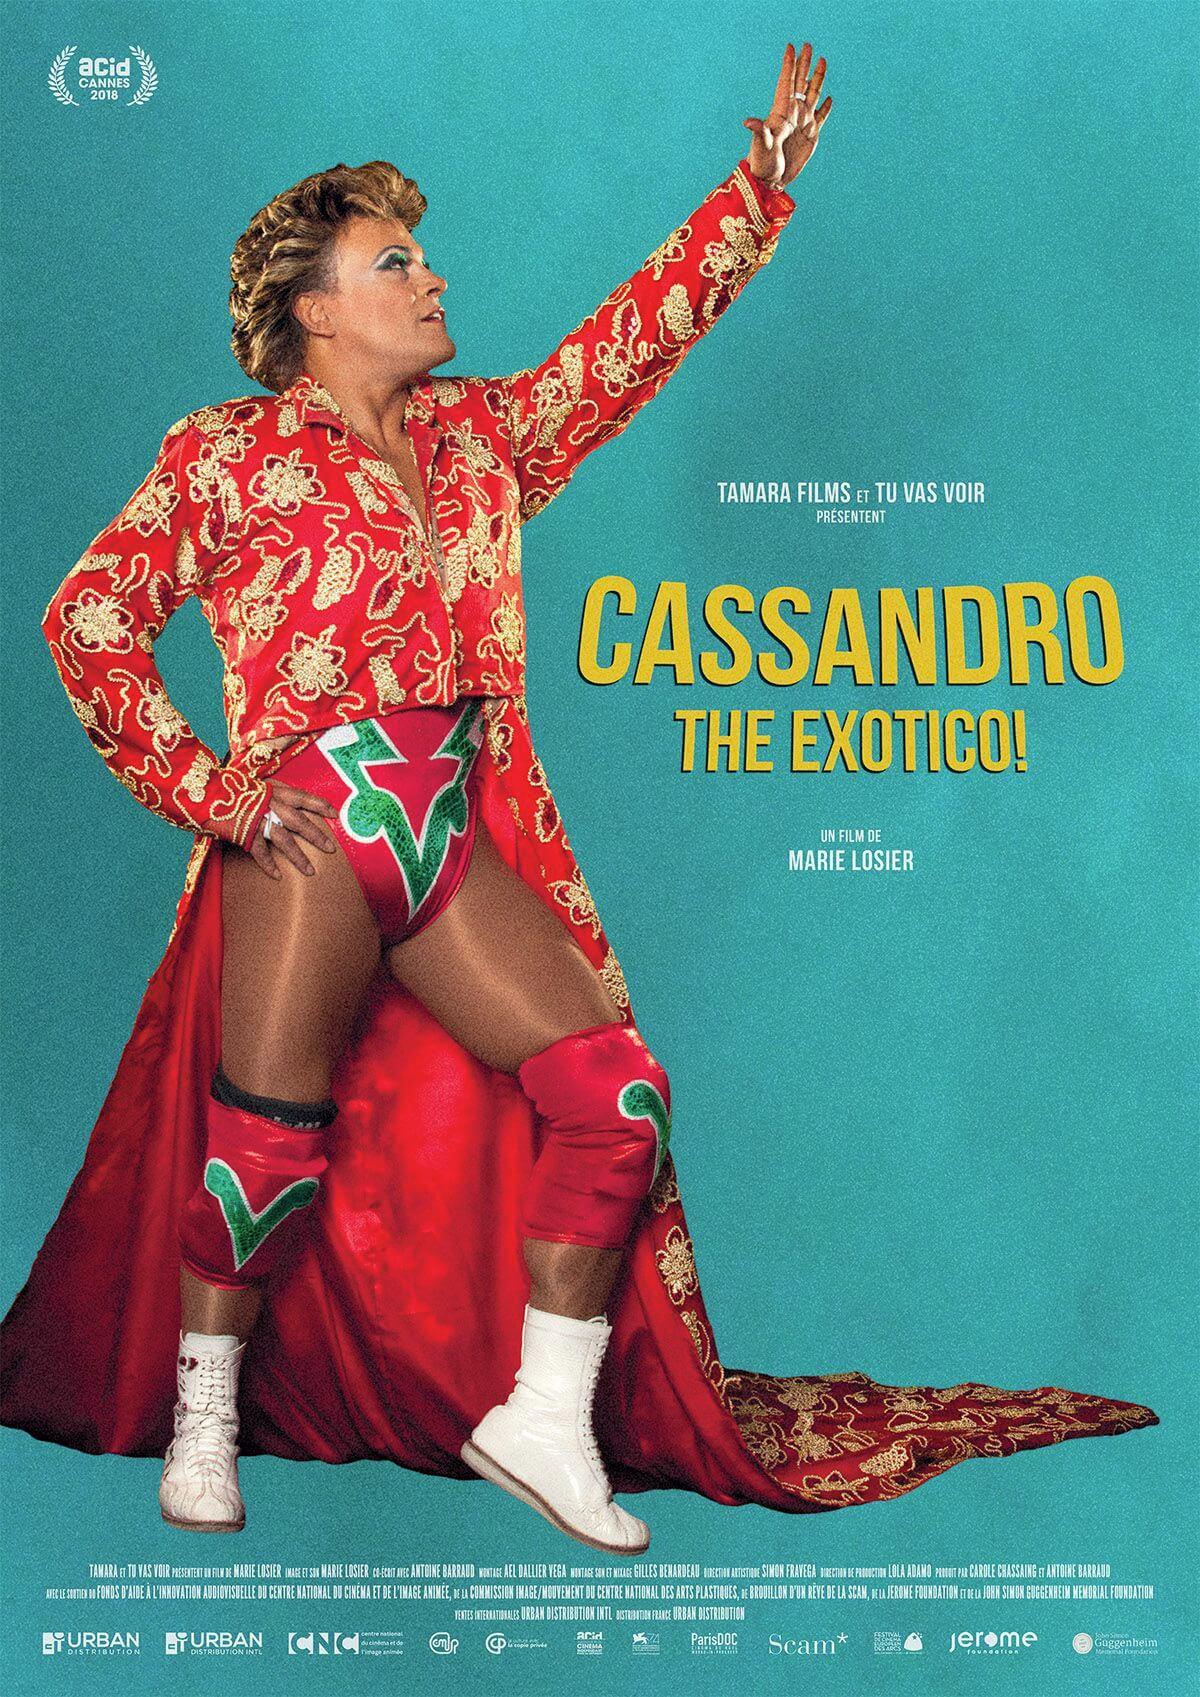 Cartel de Cassandro, The Exotico! (VOS en inglés)